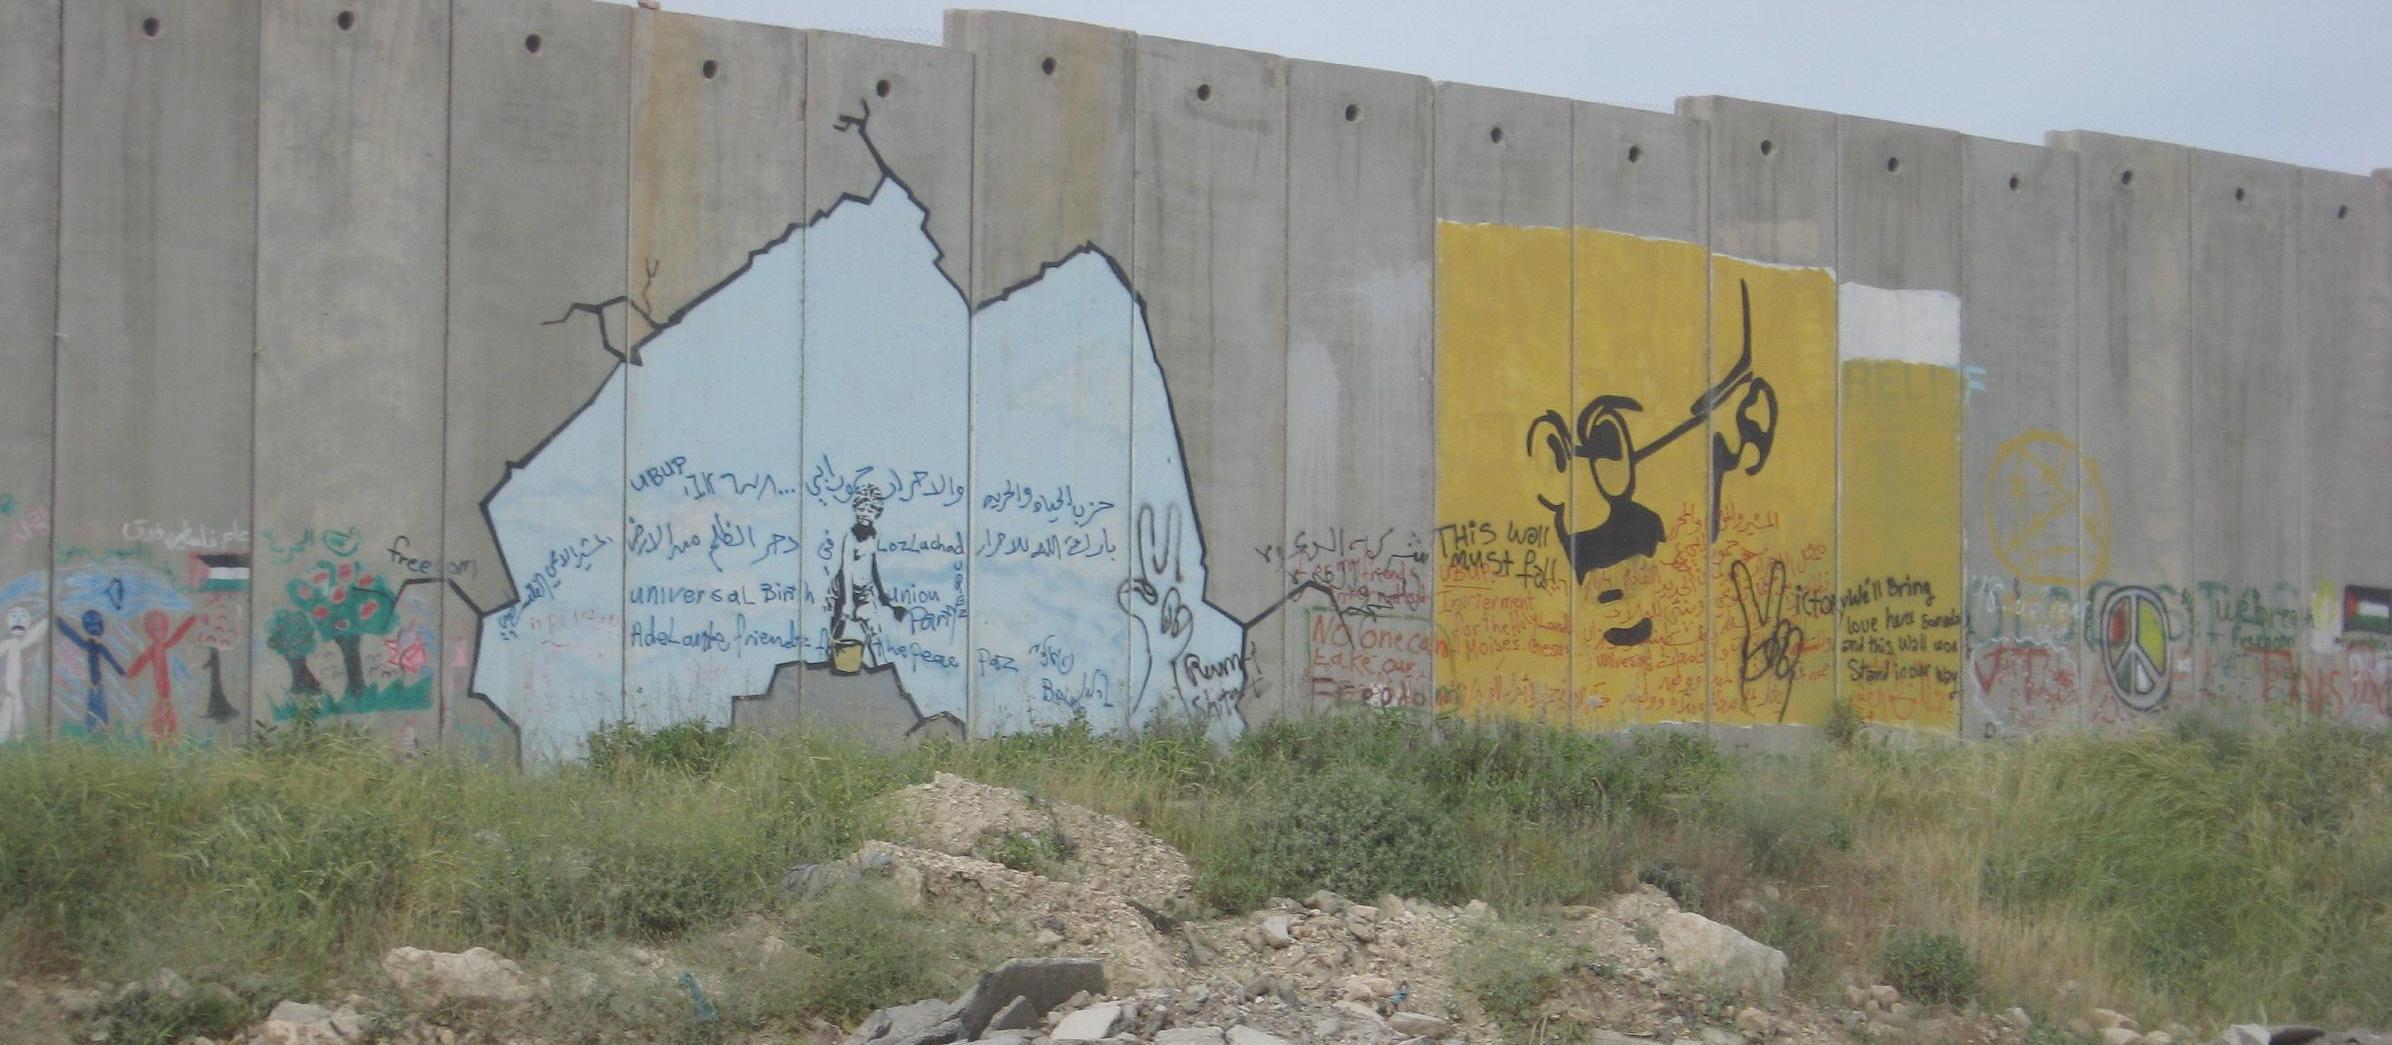 Graffiti paintings on the Israeli West Bank barrier by Banksy near Qalandia - July 2005 - Public Domain